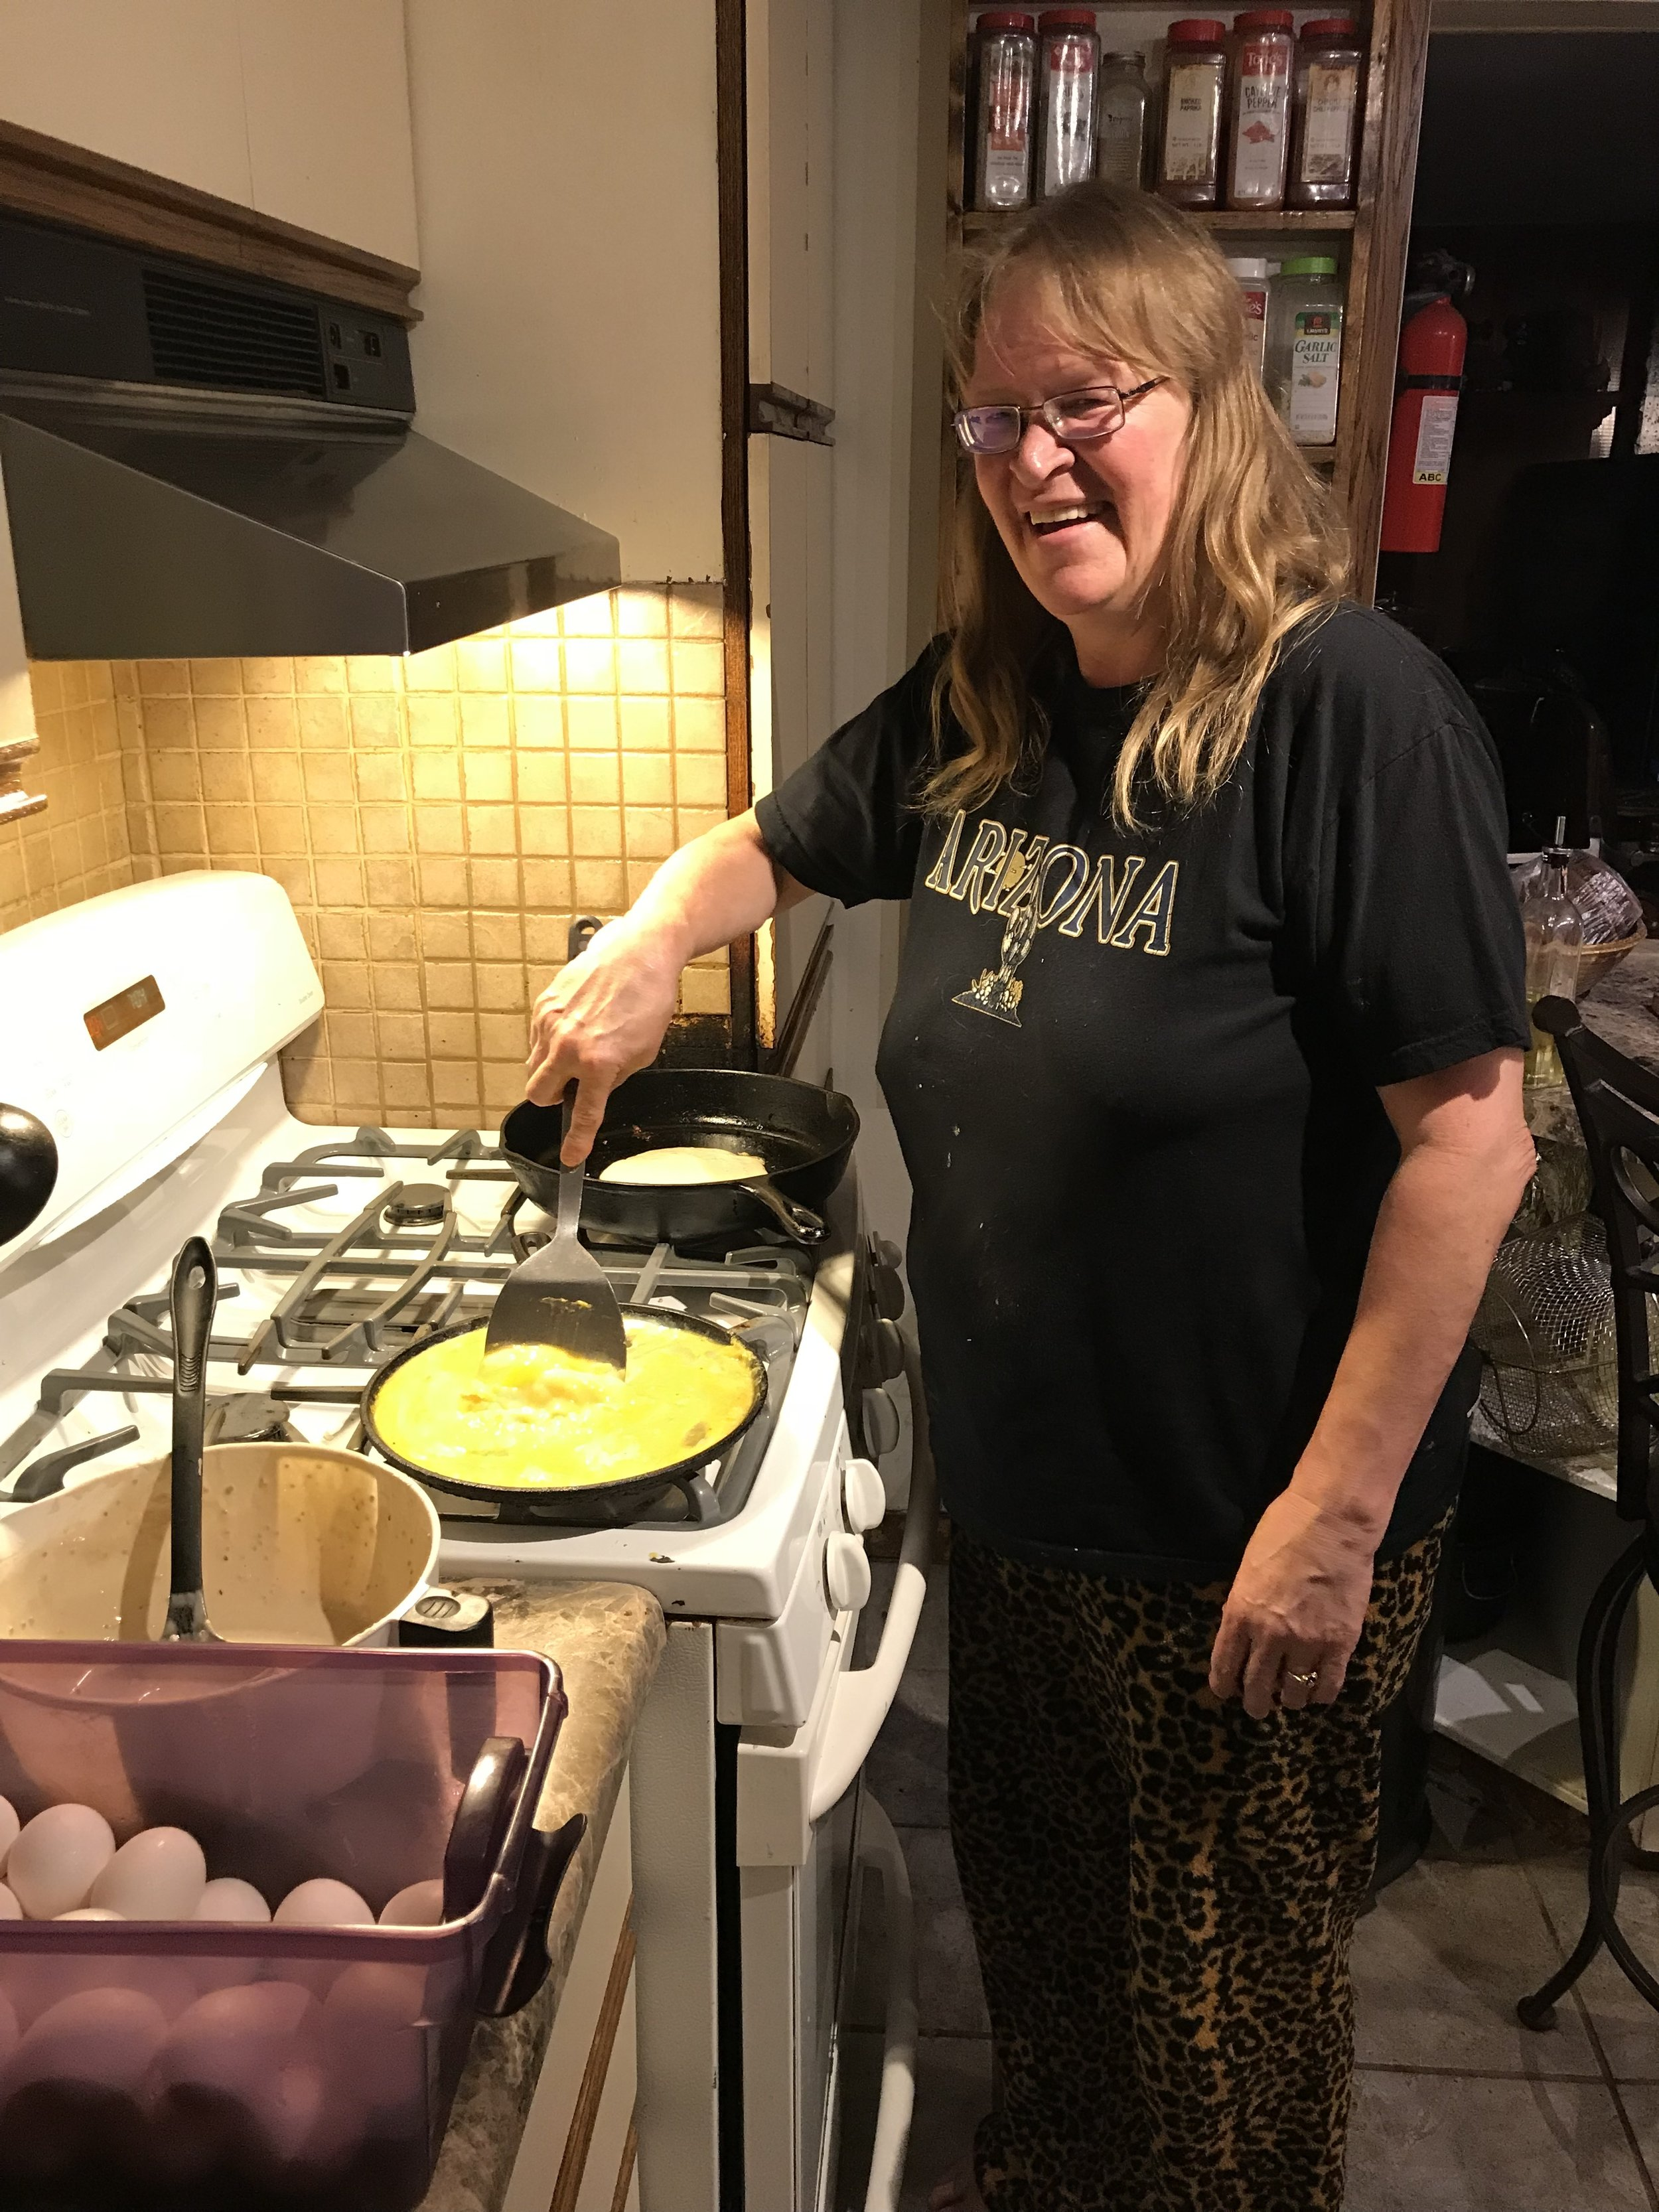 Our gracious host, Kim, cooking us an amazing breakfast: sourdough, chia, hemp pancakes and eggs.